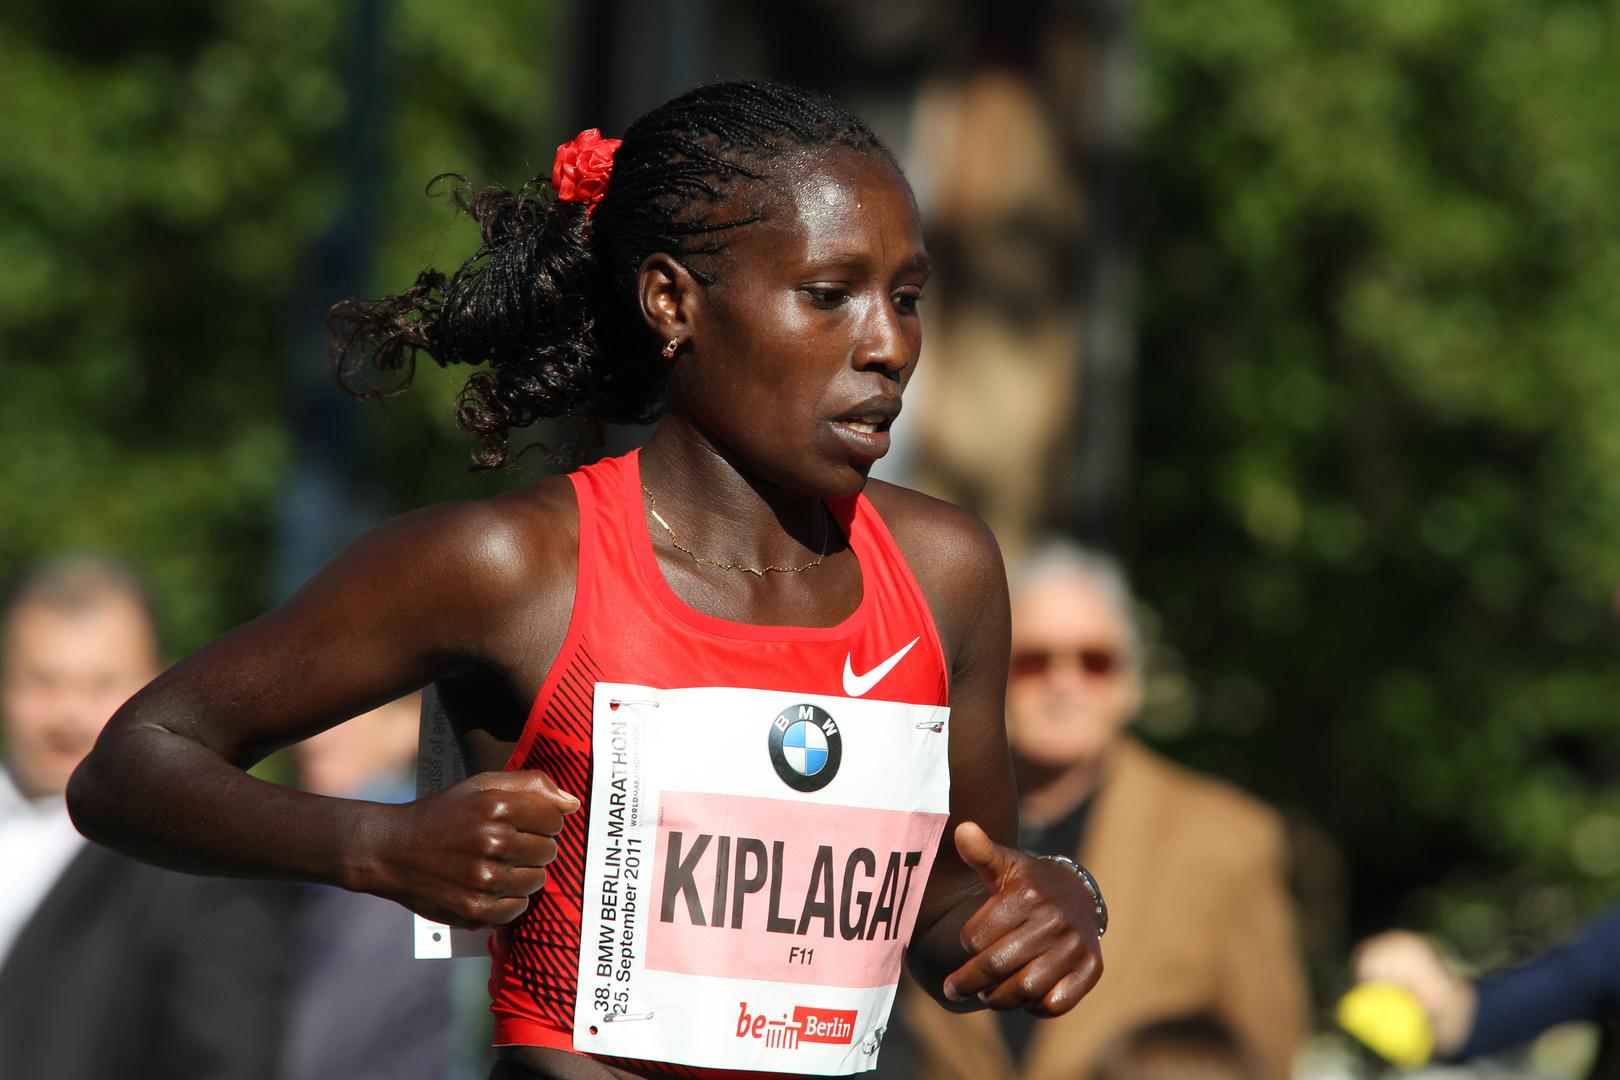 Florence Kiplagat